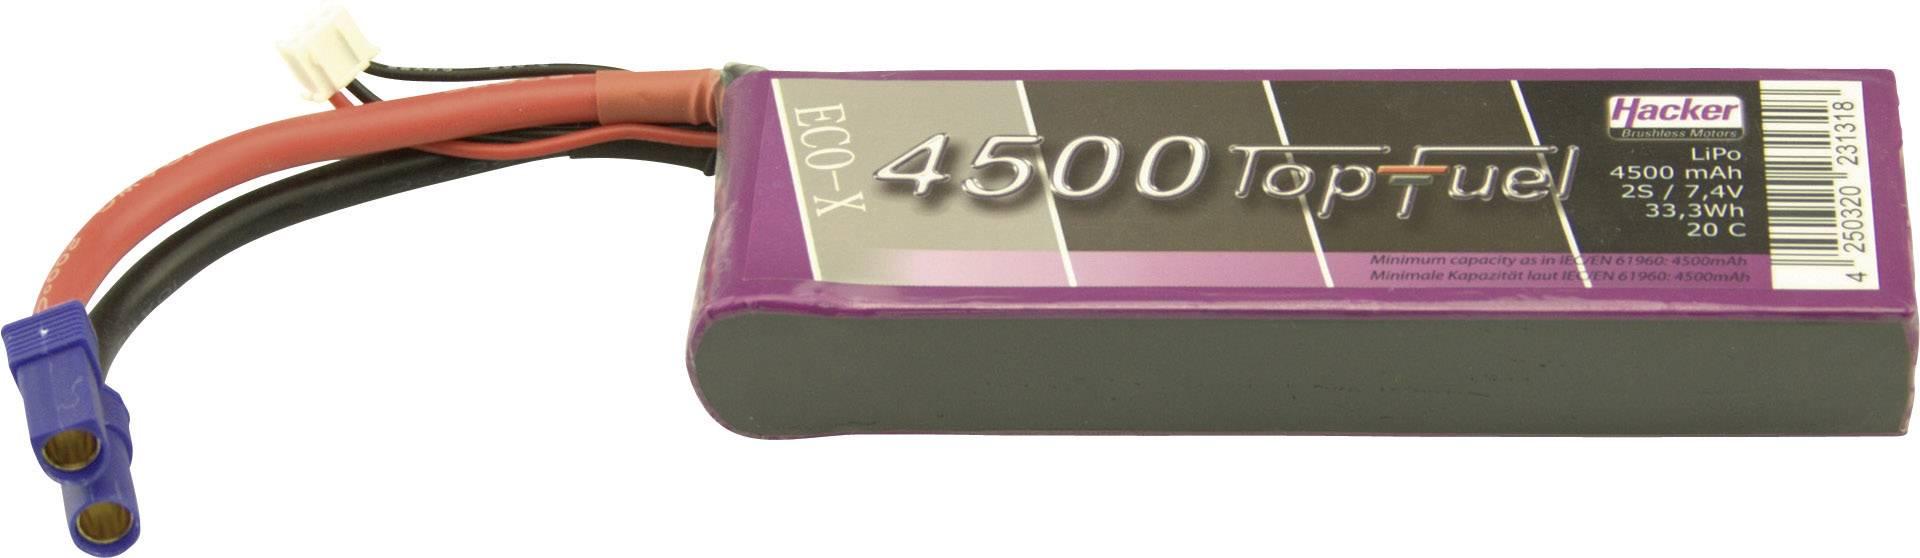 Akupack Li-Pol Hacker 34500231, 7.4 V, 4500 mAh